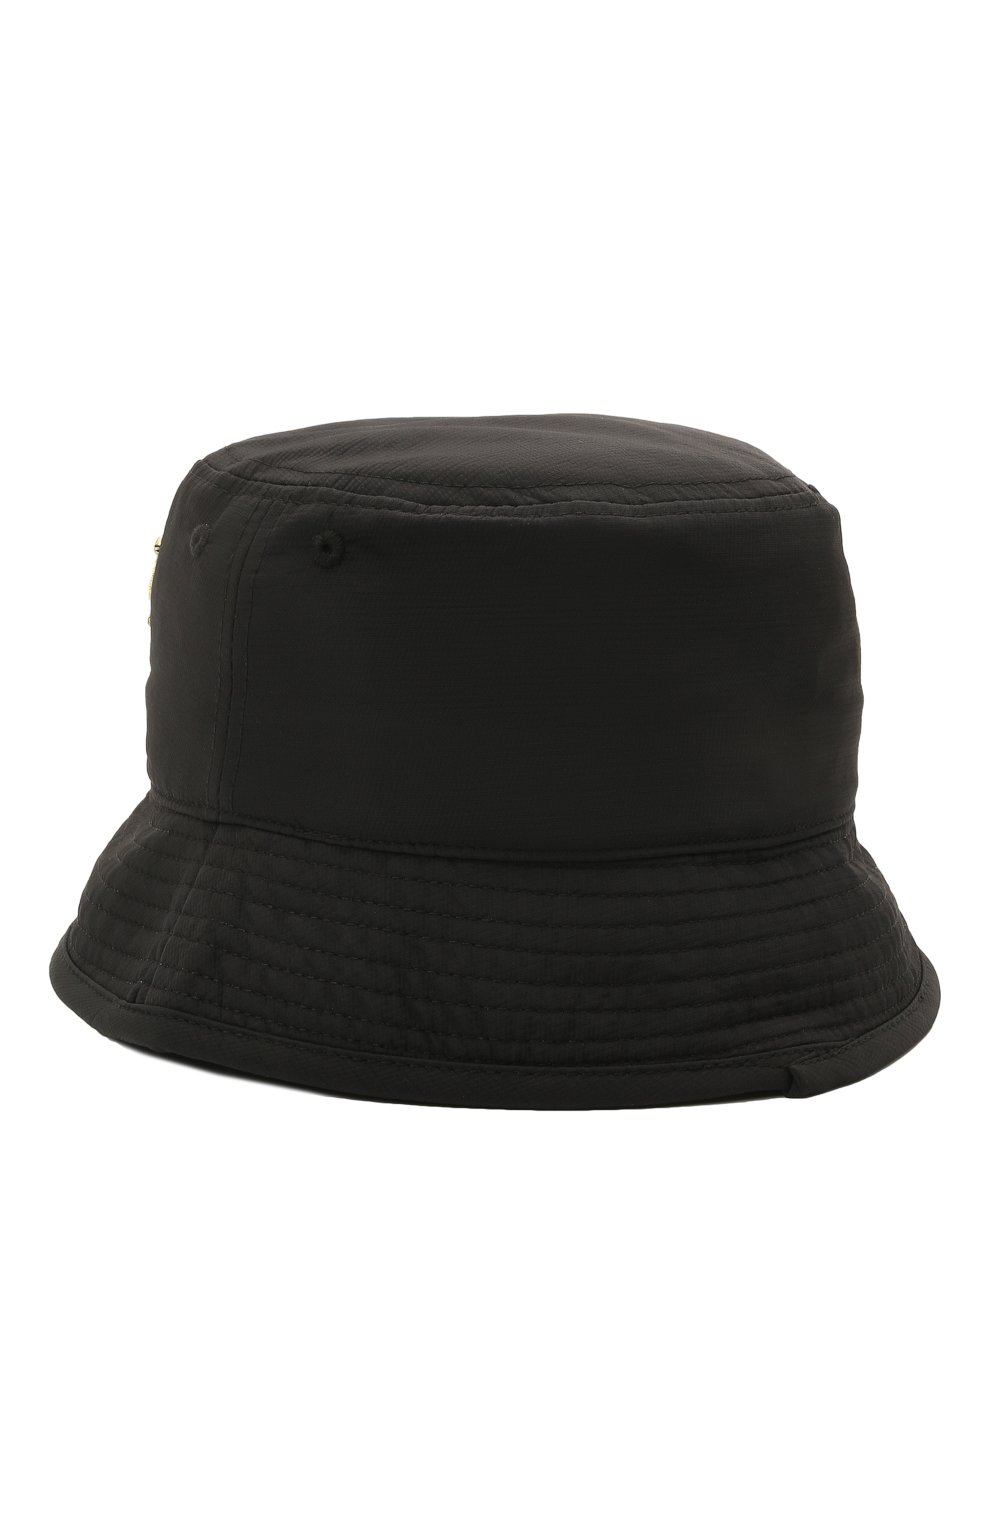 Женская панама VERSACE JEANS COUTURE черного цвета, арт. E8VWAK05-LINEA W0MAN BUCKET HAT DIS./85070   Фото 2